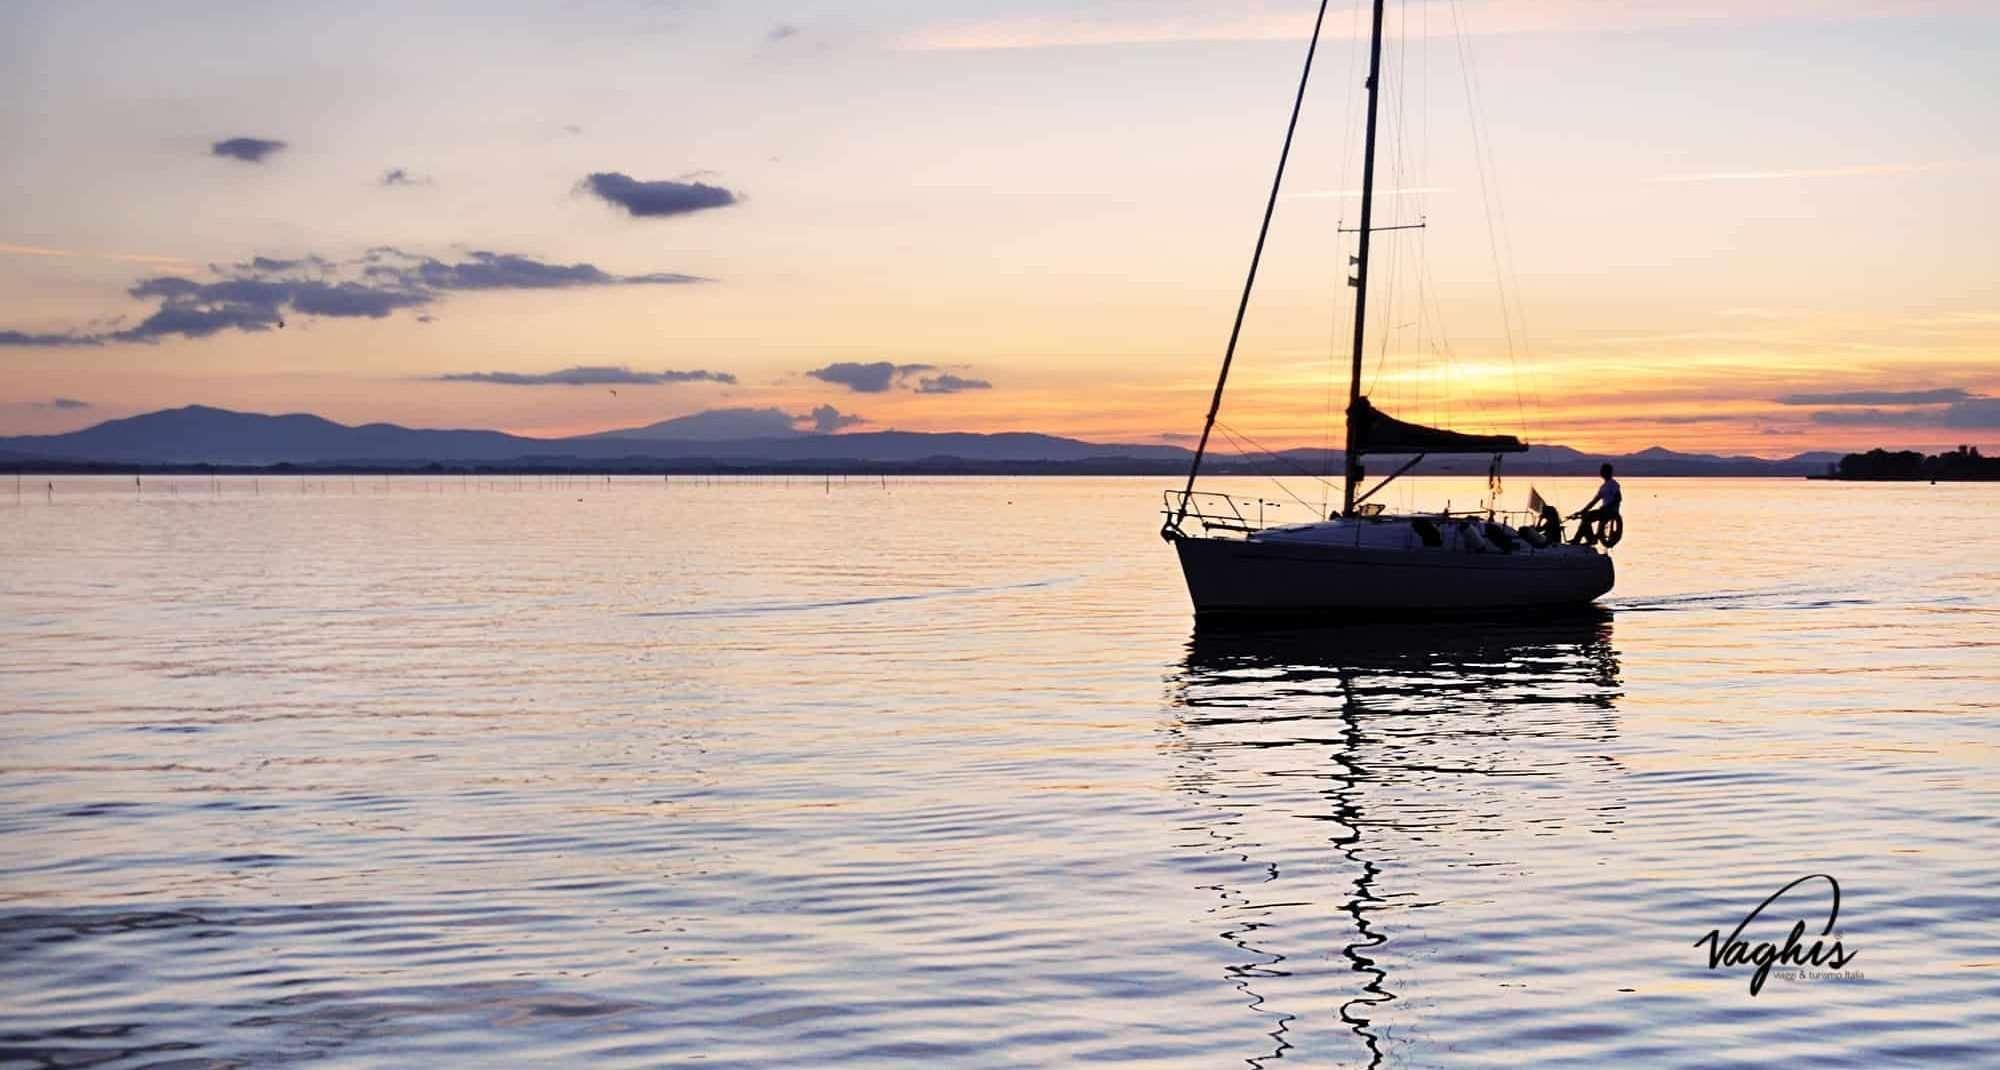 Isola Polvese - © Vaghis - viaggi & turismo Italia - Tutti i diritti riservati